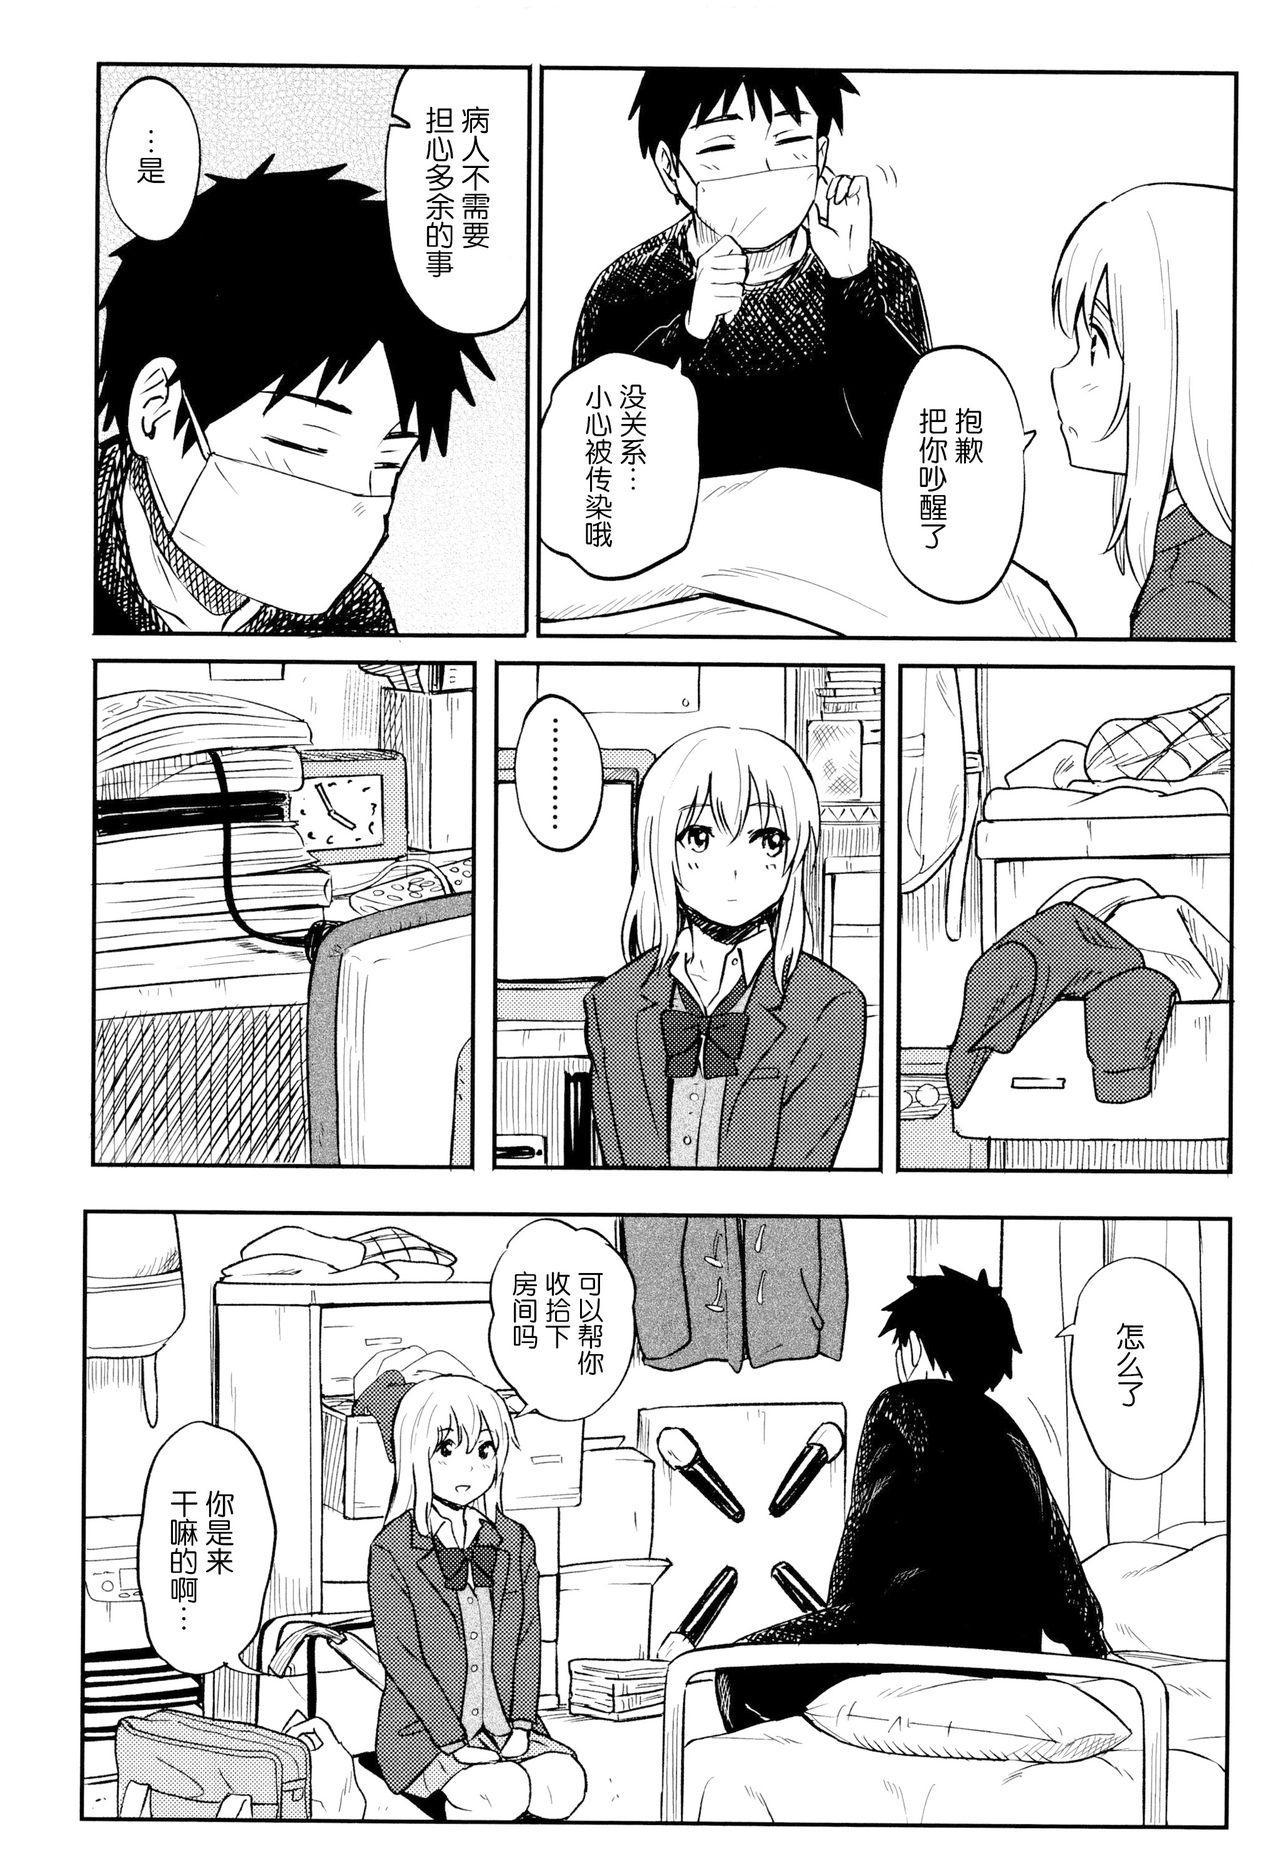 Tokubetsu na Mainichi - Special daily 42